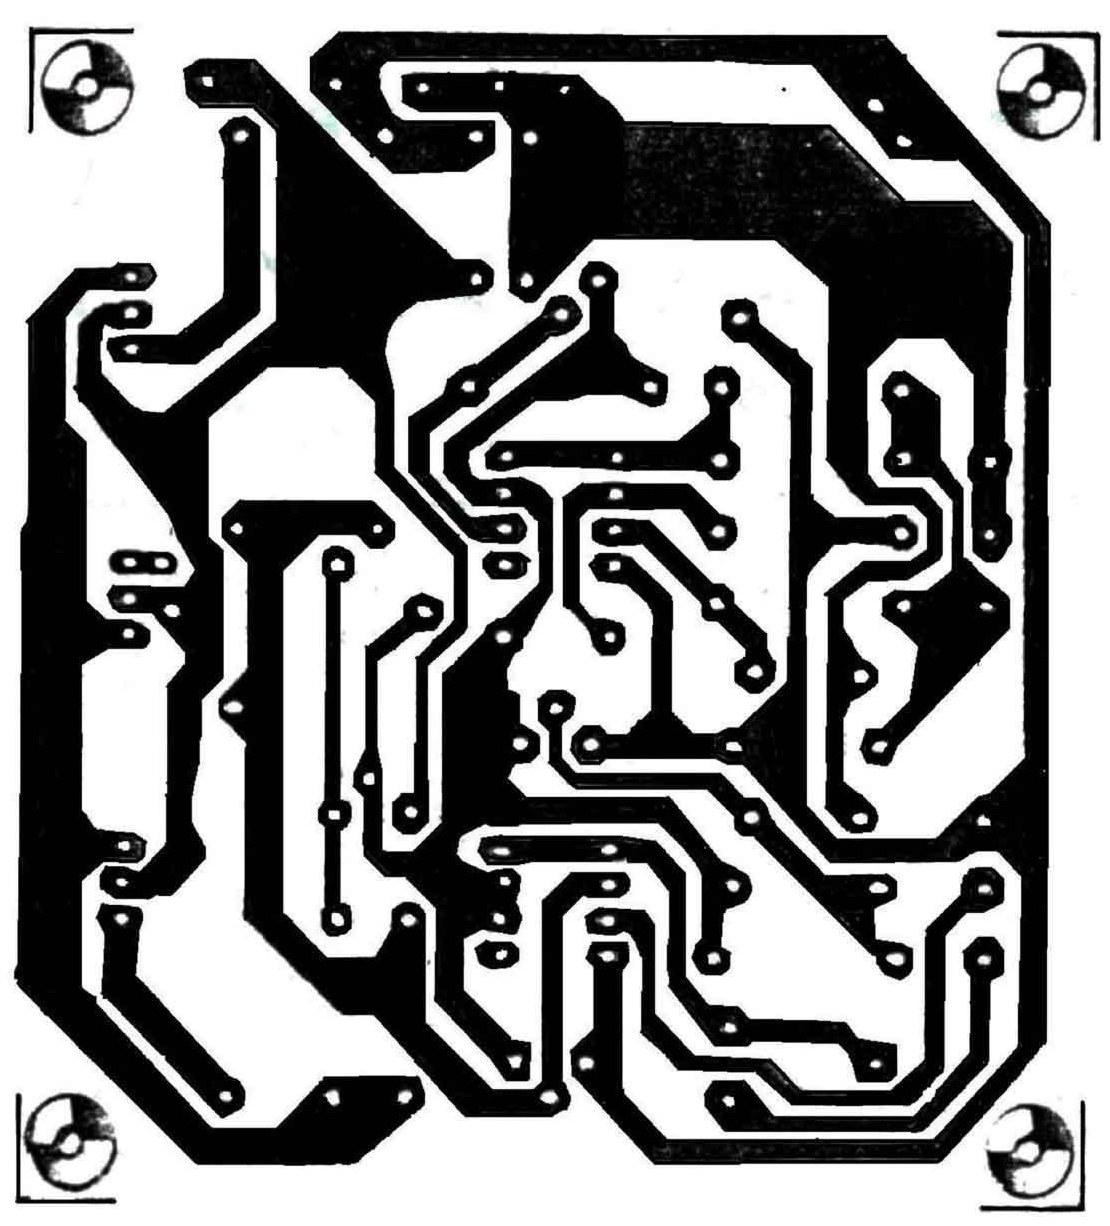 3 30v 3a Adjustable Regulated Dc Power Supply likewise 12v Dc Power additionally 250w 2x35 Volt Smps Devresi Atx Psu Modifiye further Ac Power Supply Transformer And Bridge Rectifier also RPi 5V PSU construction. on transformerless power supply circuit diagram